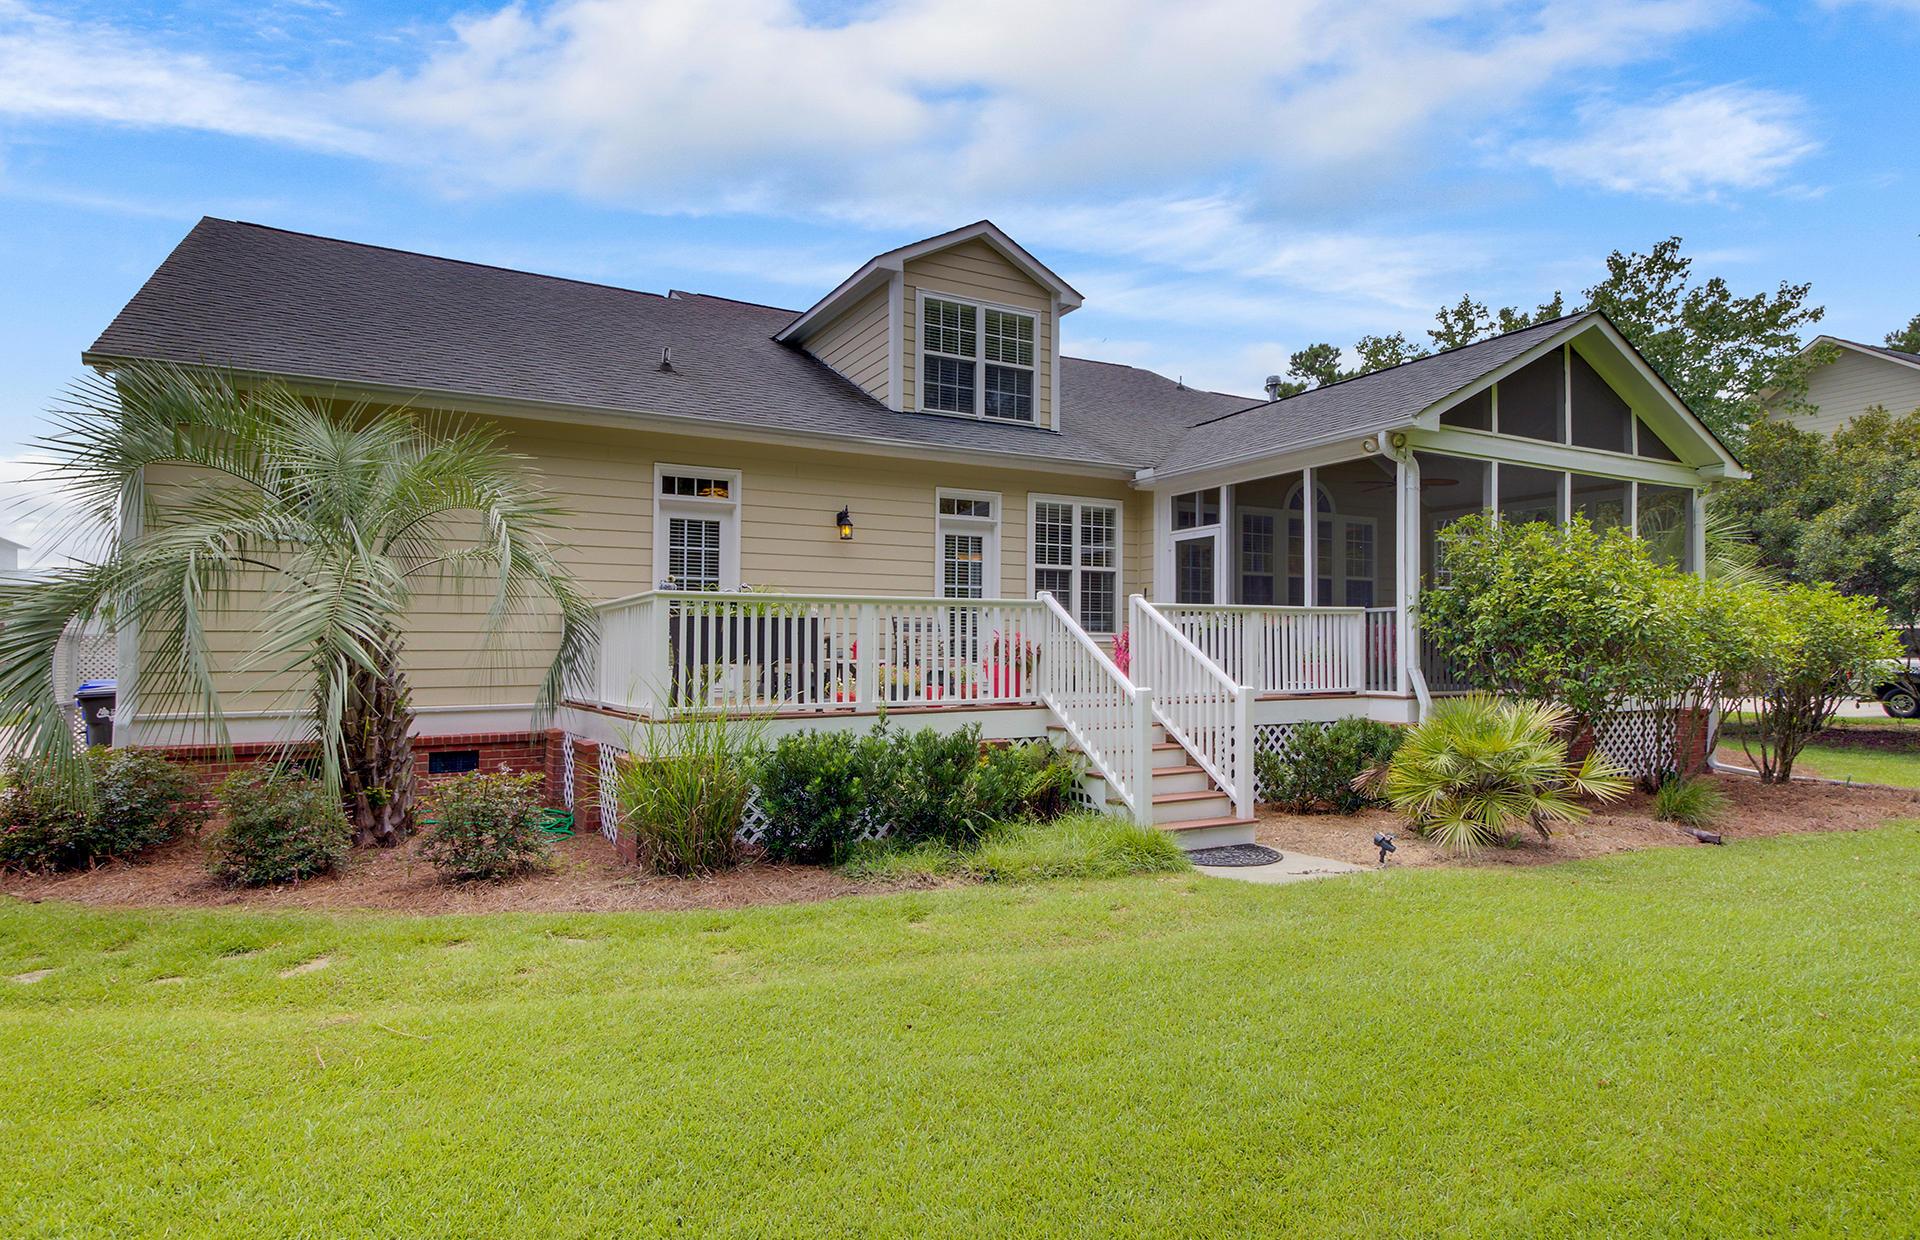 Dunes West Homes For Sale - 2453 Darts Cove, Mount Pleasant, SC - 17